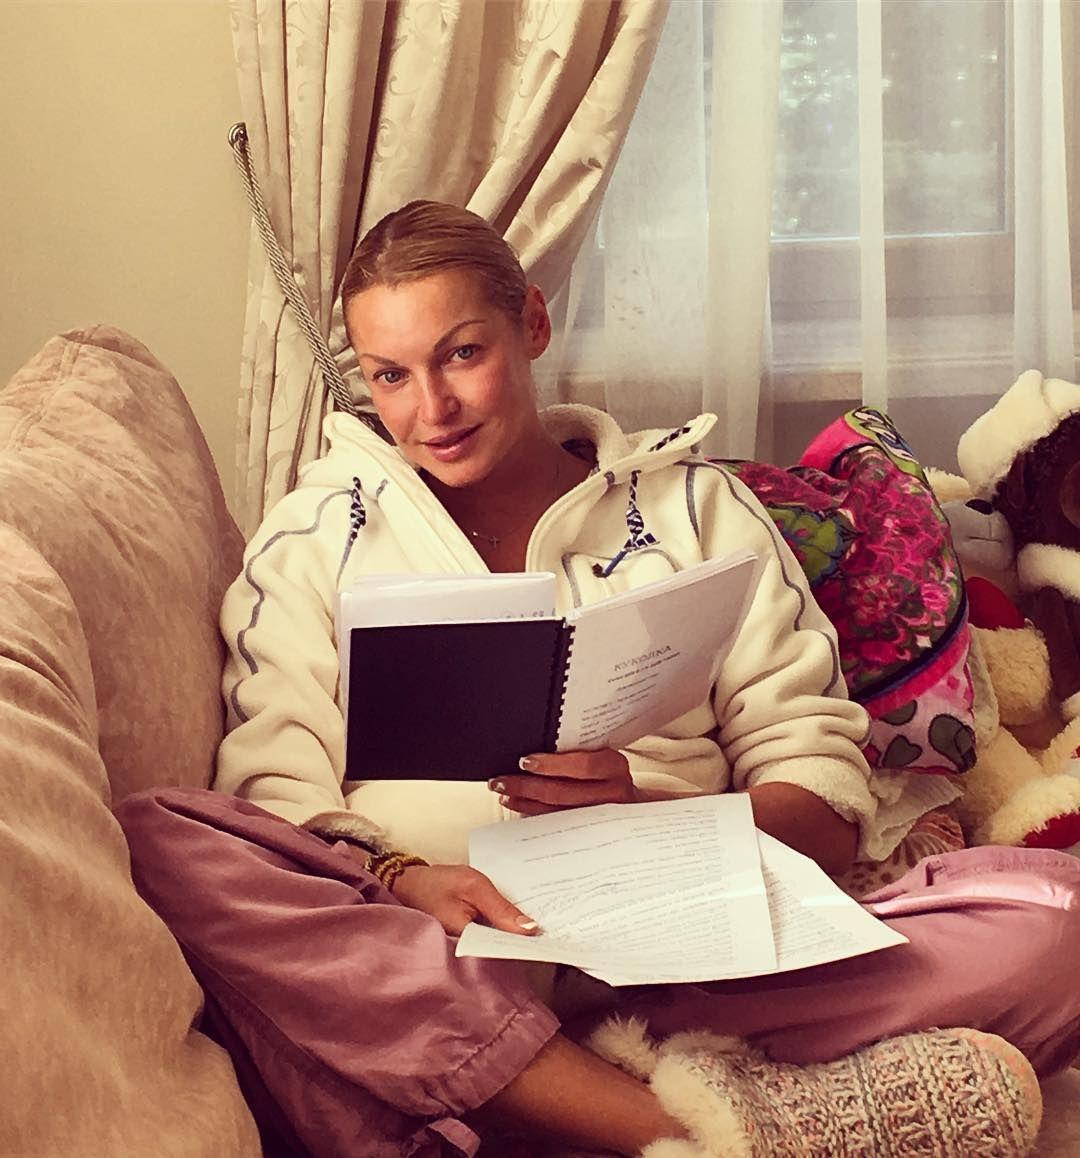 Анастасия Волочкова Фото (Anastasiya Volochkova Photo) русская балерина / Страница - 4